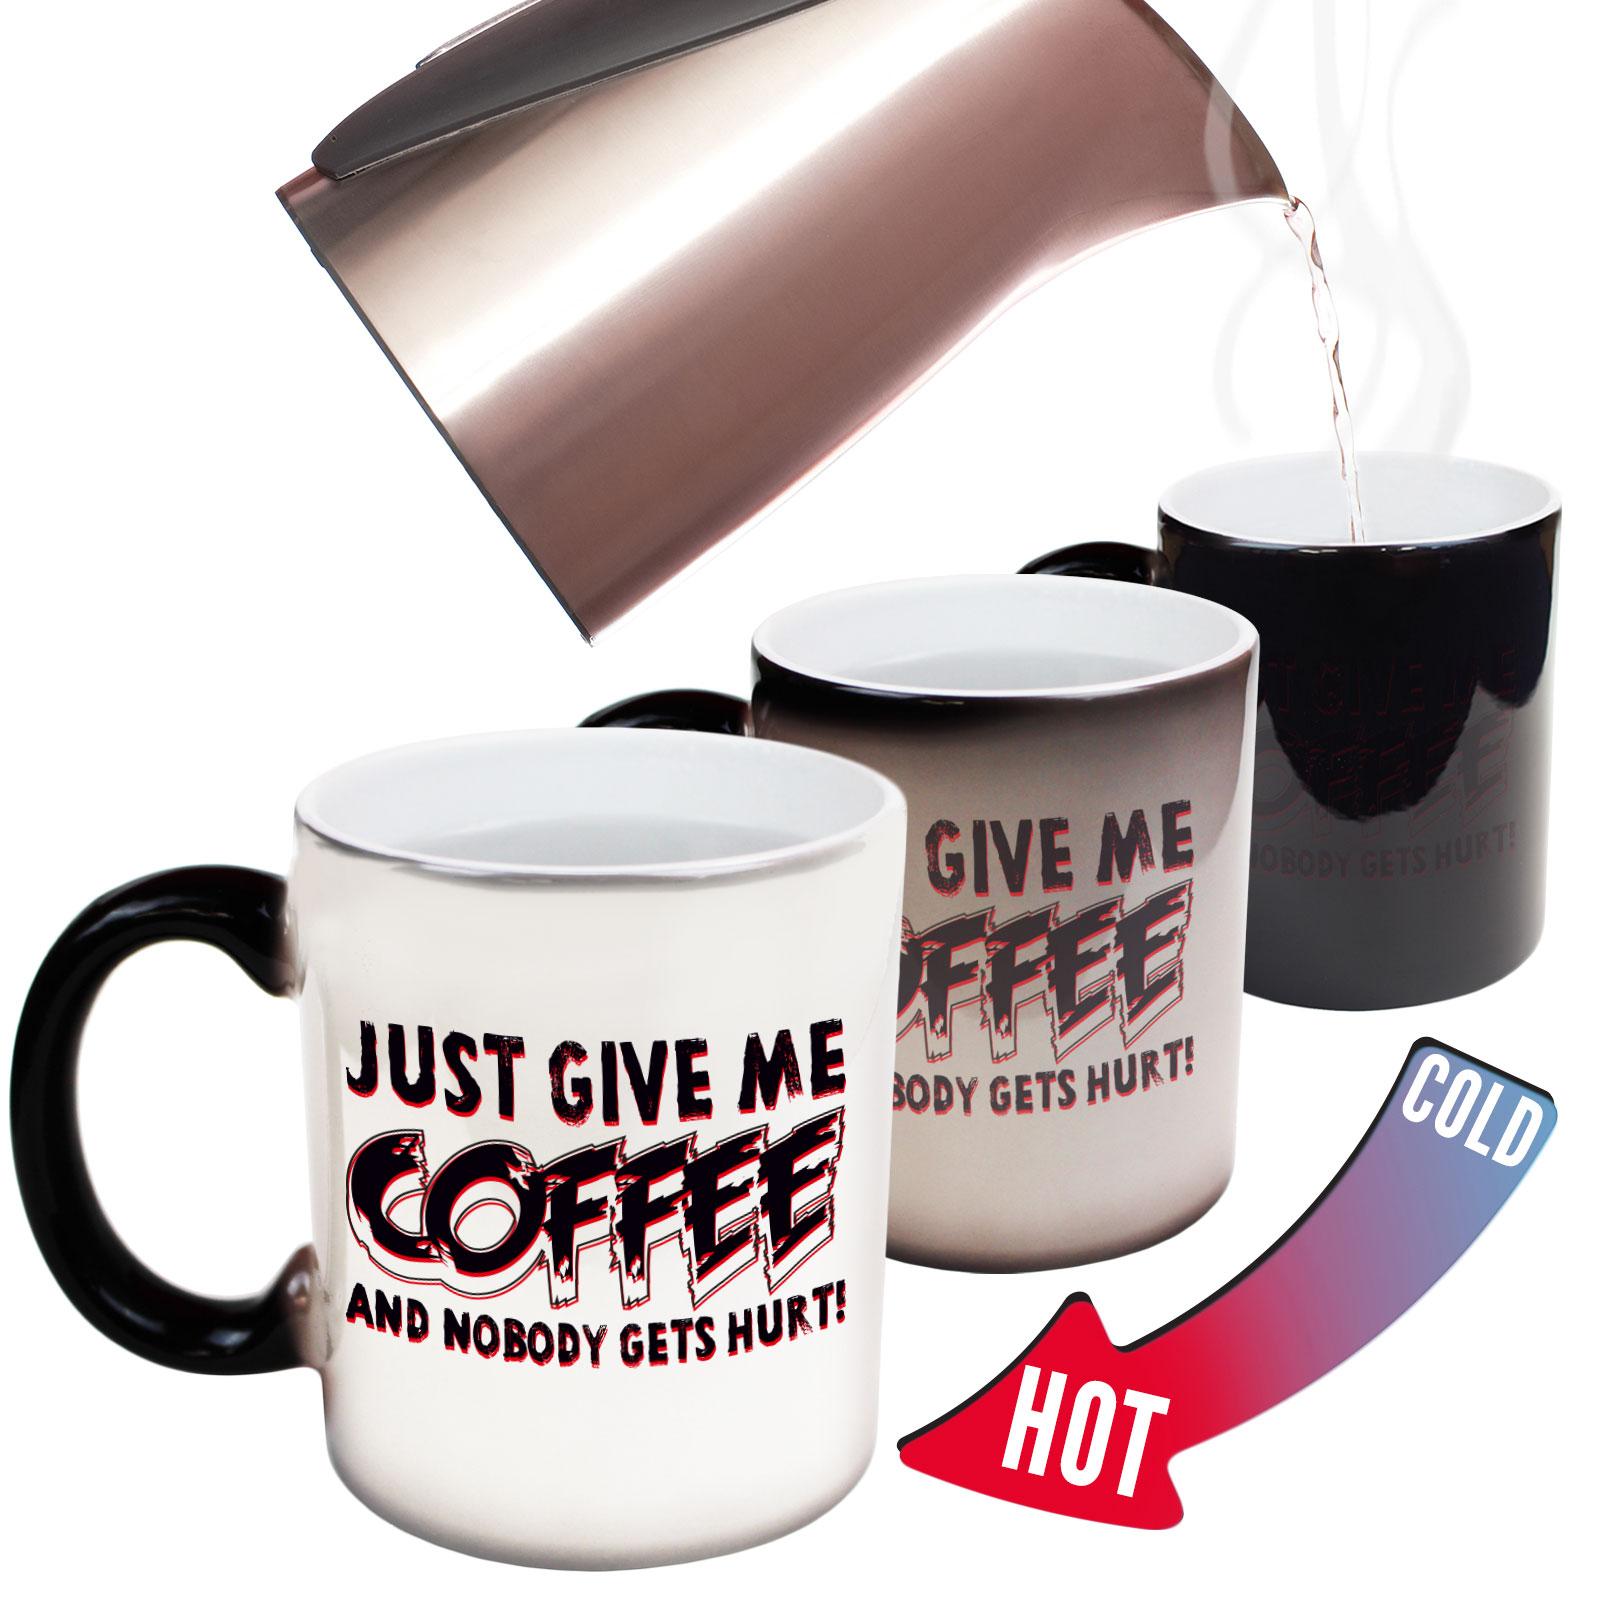 Coffee Energy Adult Humour MAGIC NOVELTY MUG Funny Mugs Caffeine Chemical